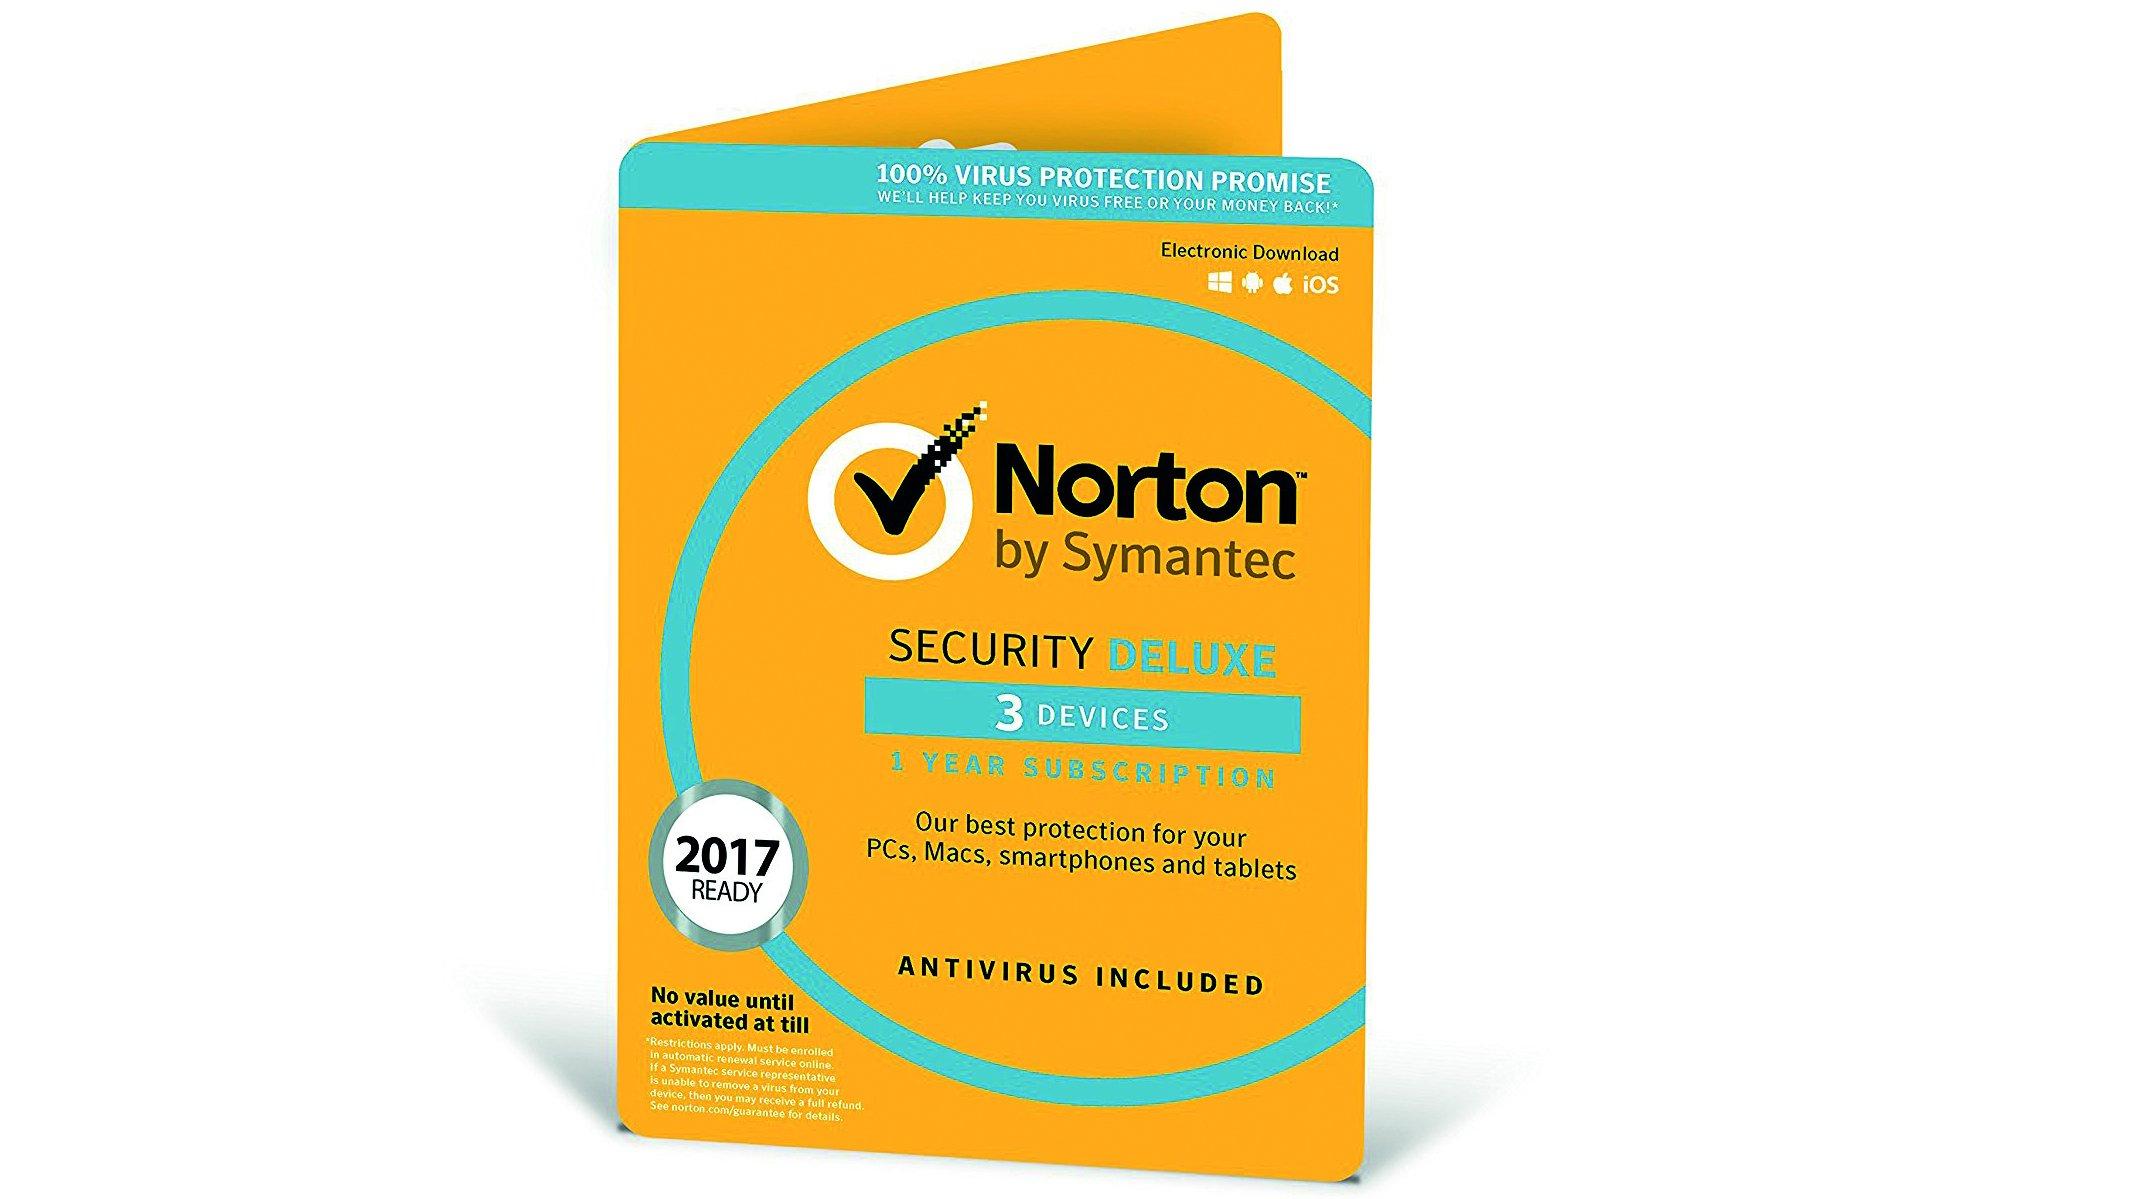 Symantec Norton Security Deluxe 2018 Review A Flexible